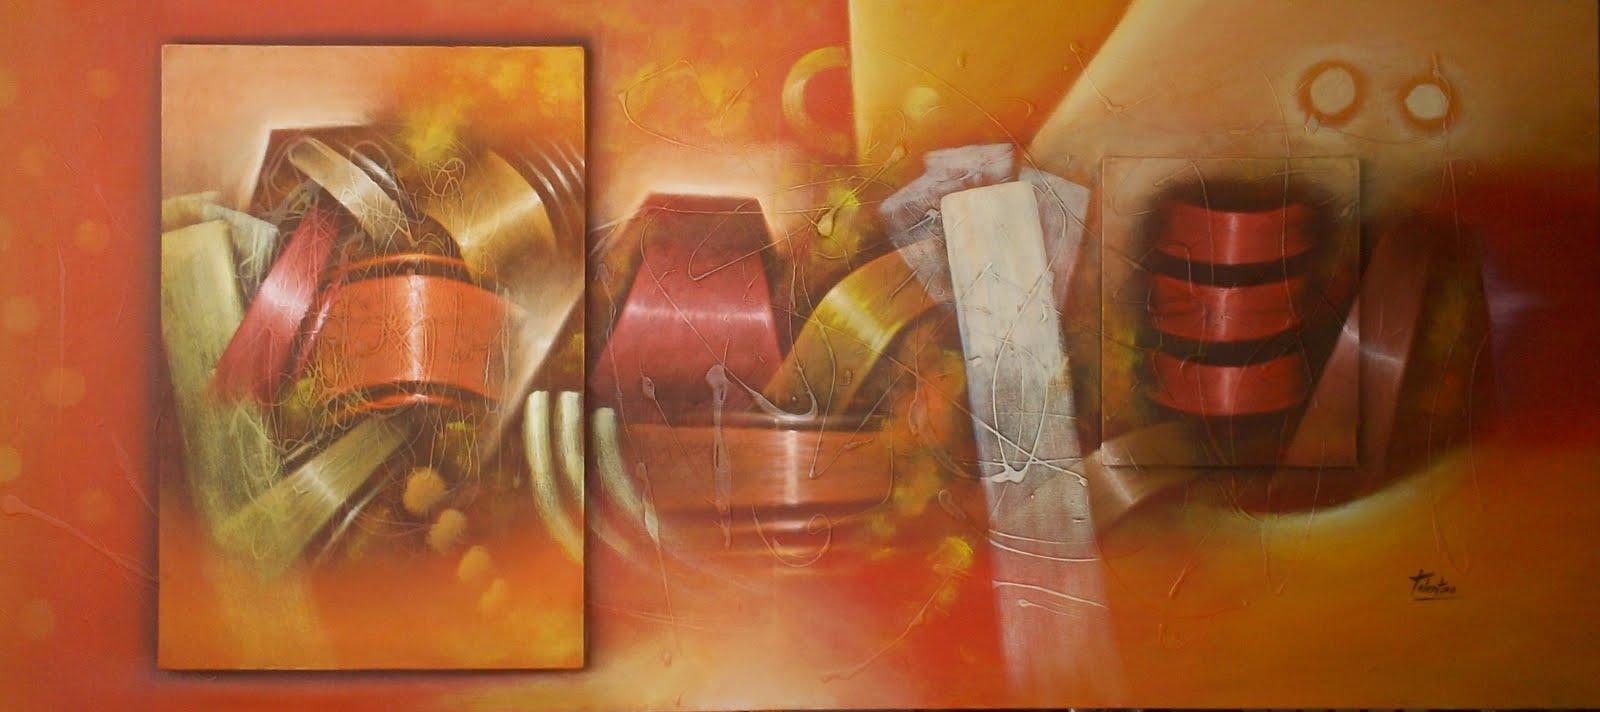 Cuadros decorativos abstractos leos alto relieve modernos - Como hacer cuadros modernos ...